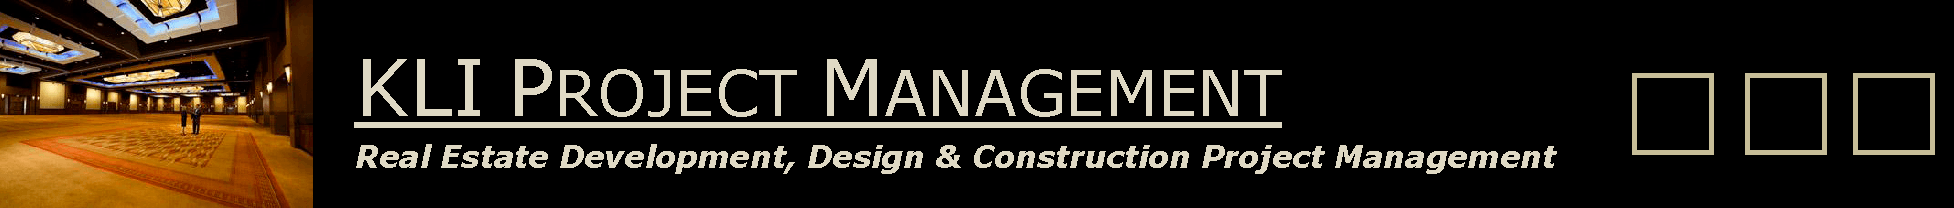 KLI Companies - Real Estate Project Management